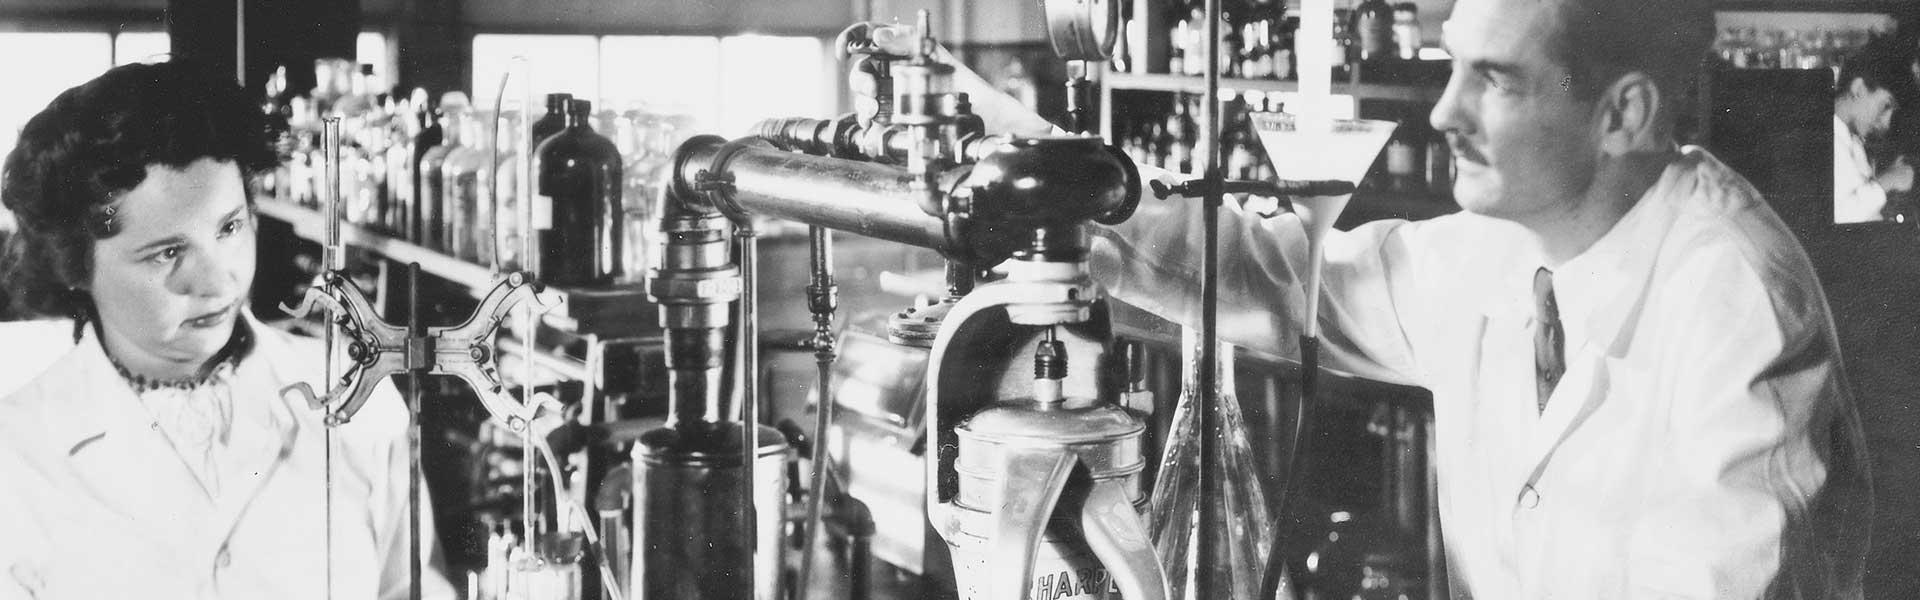 Gertrude Elion i George Hitchings al laboratori l'any 1948